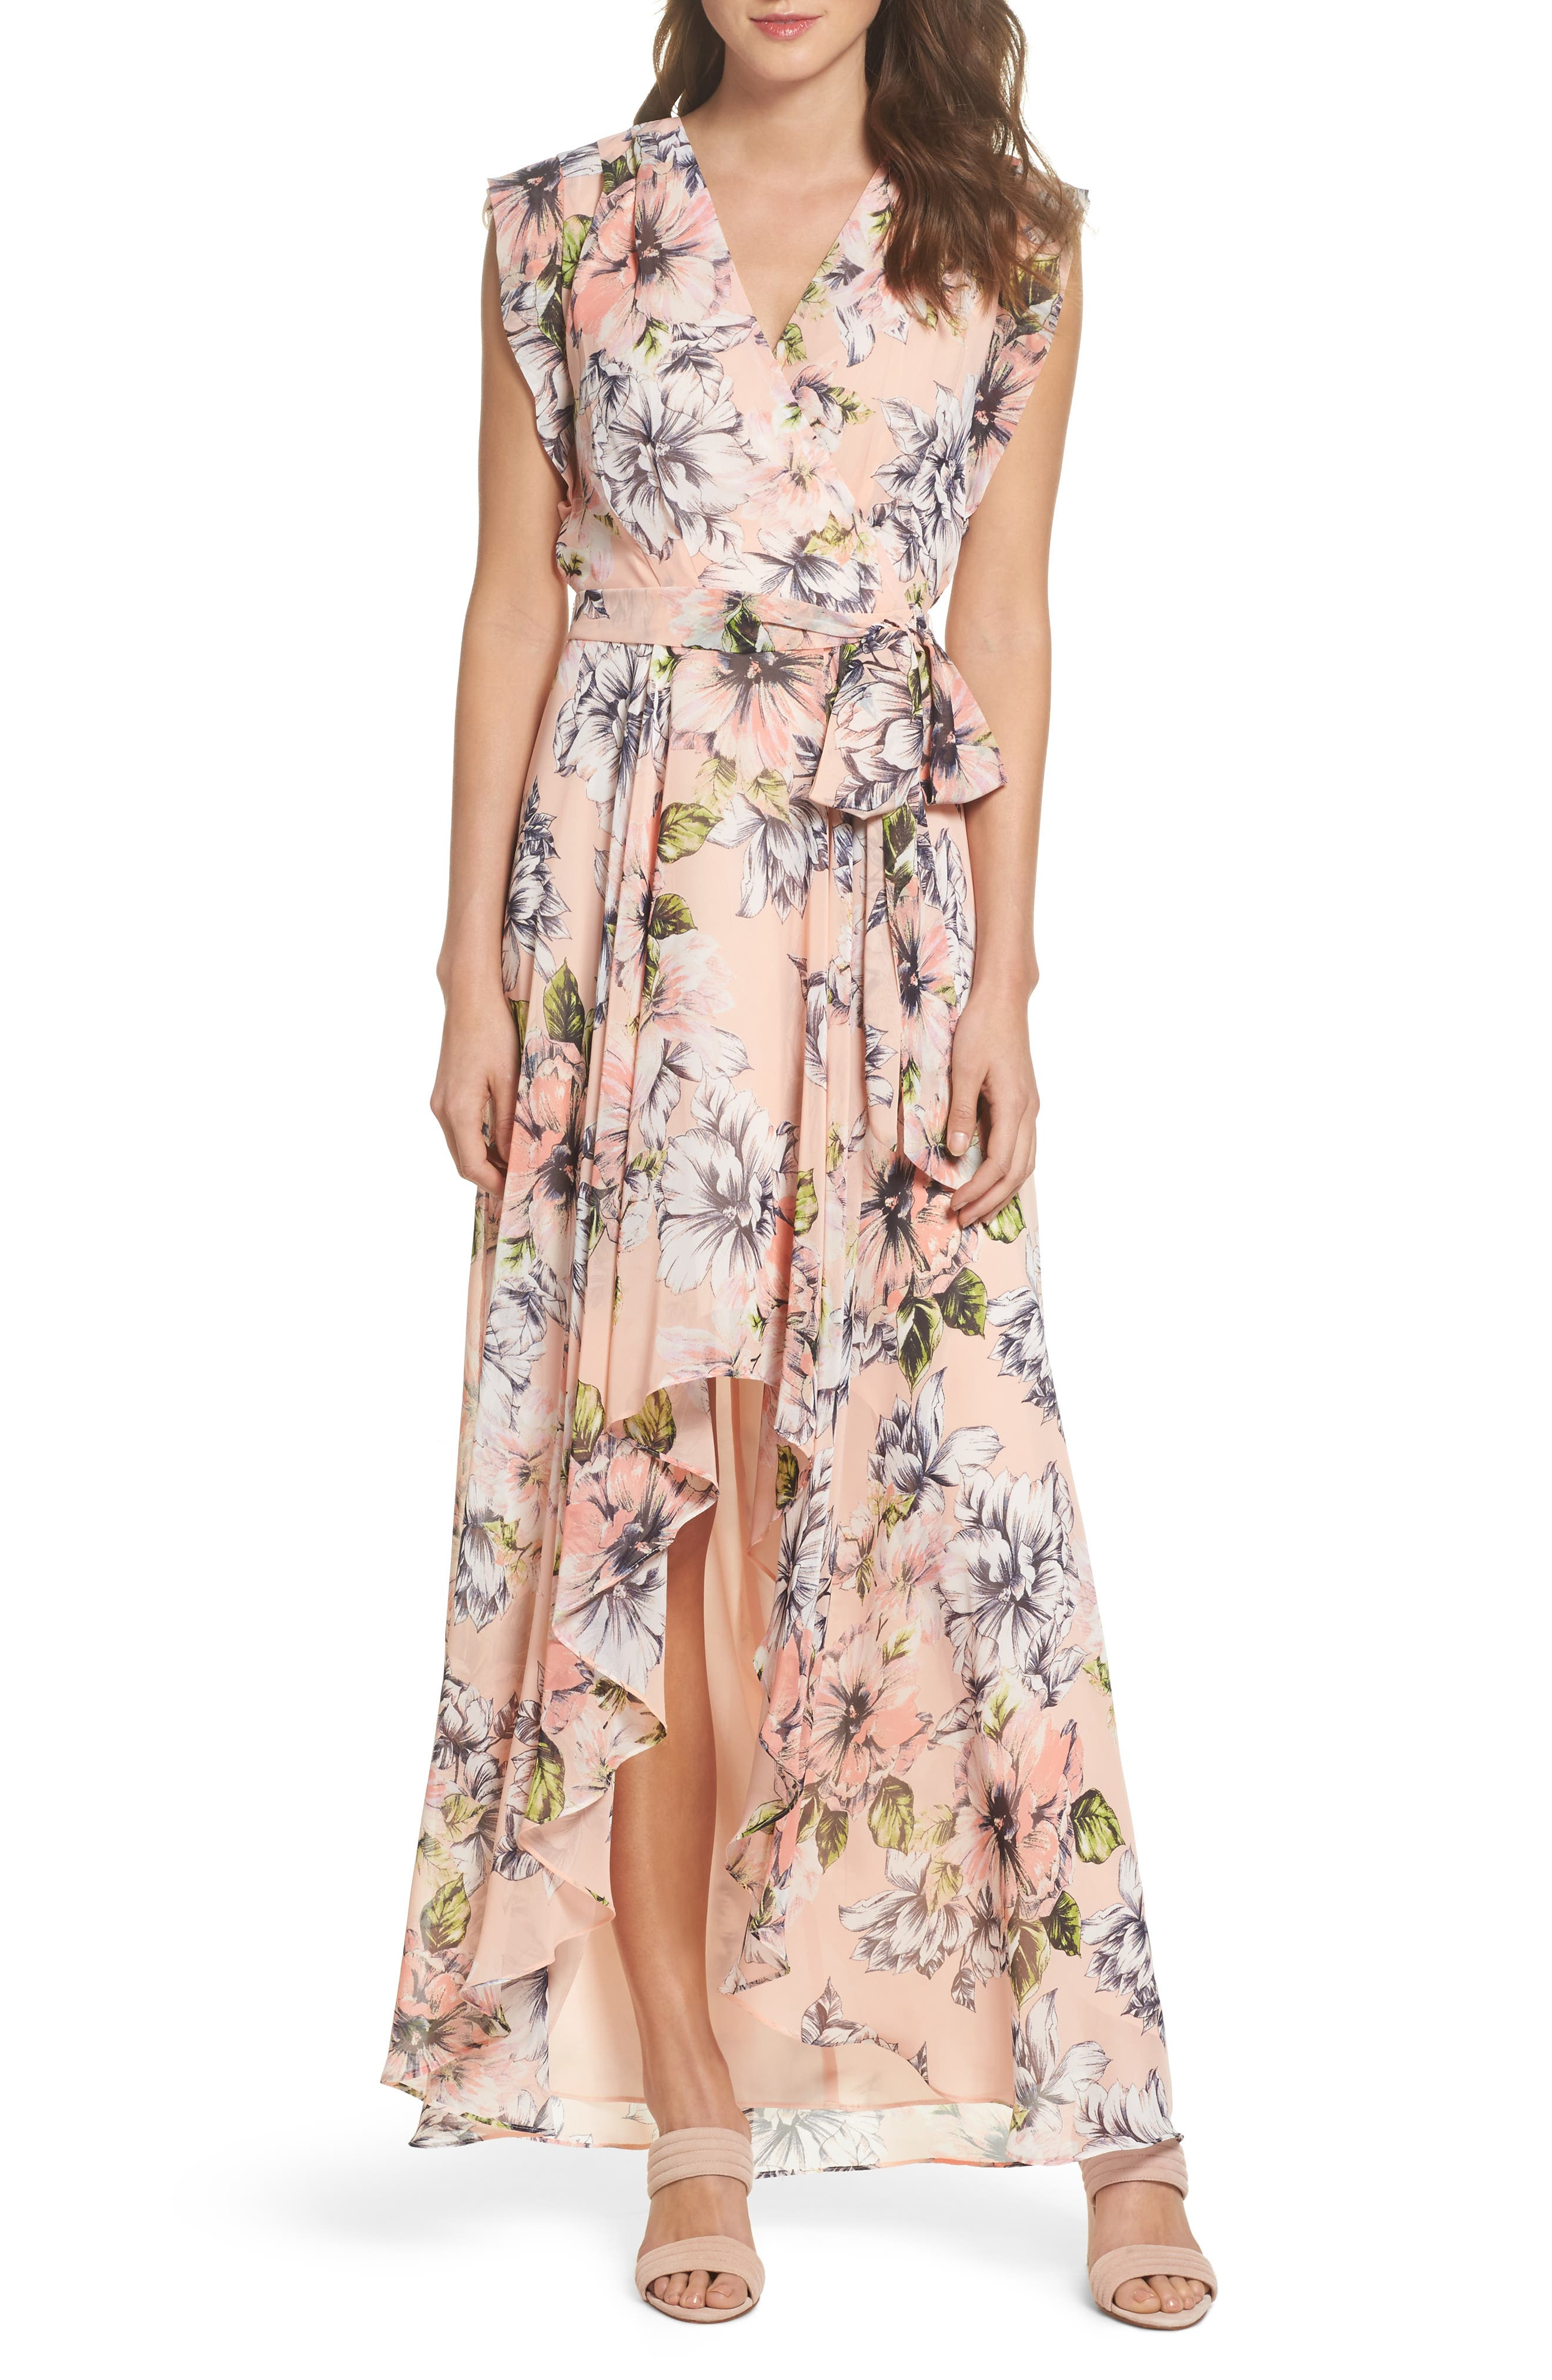 Alternate Image 1 Selected - Eliza J Floral Ruffle High/Low Maxi Dress